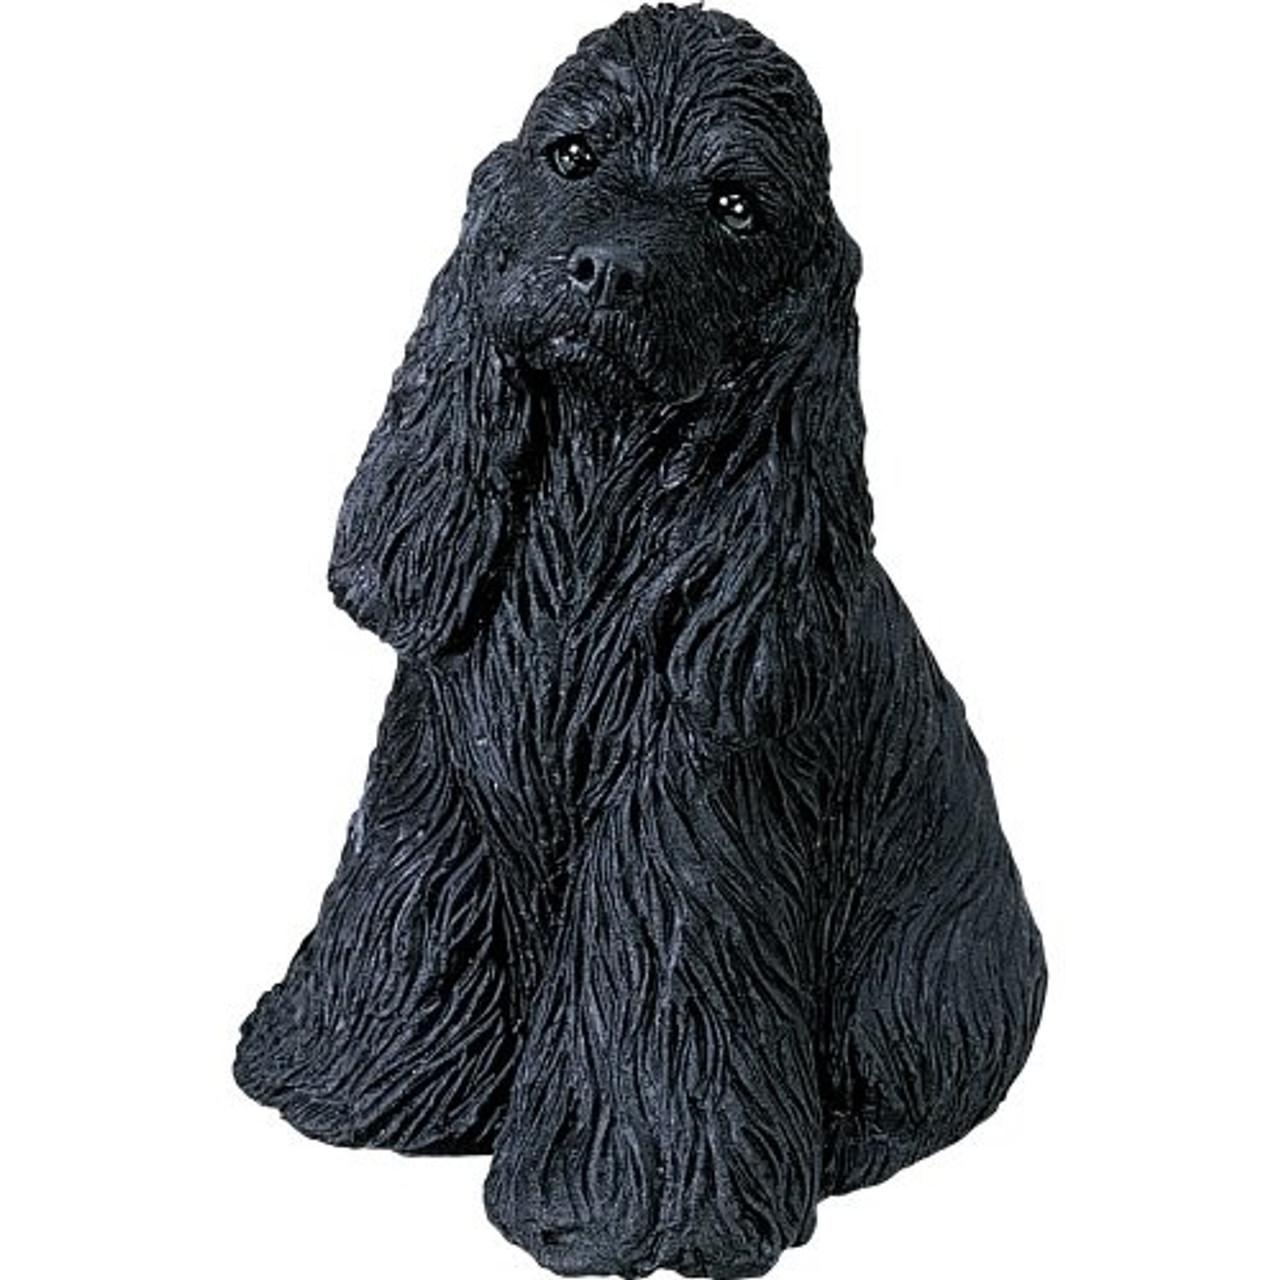 Sandicast Mid Size Black Sitting Cocker Spaniel Sculpture Ms202